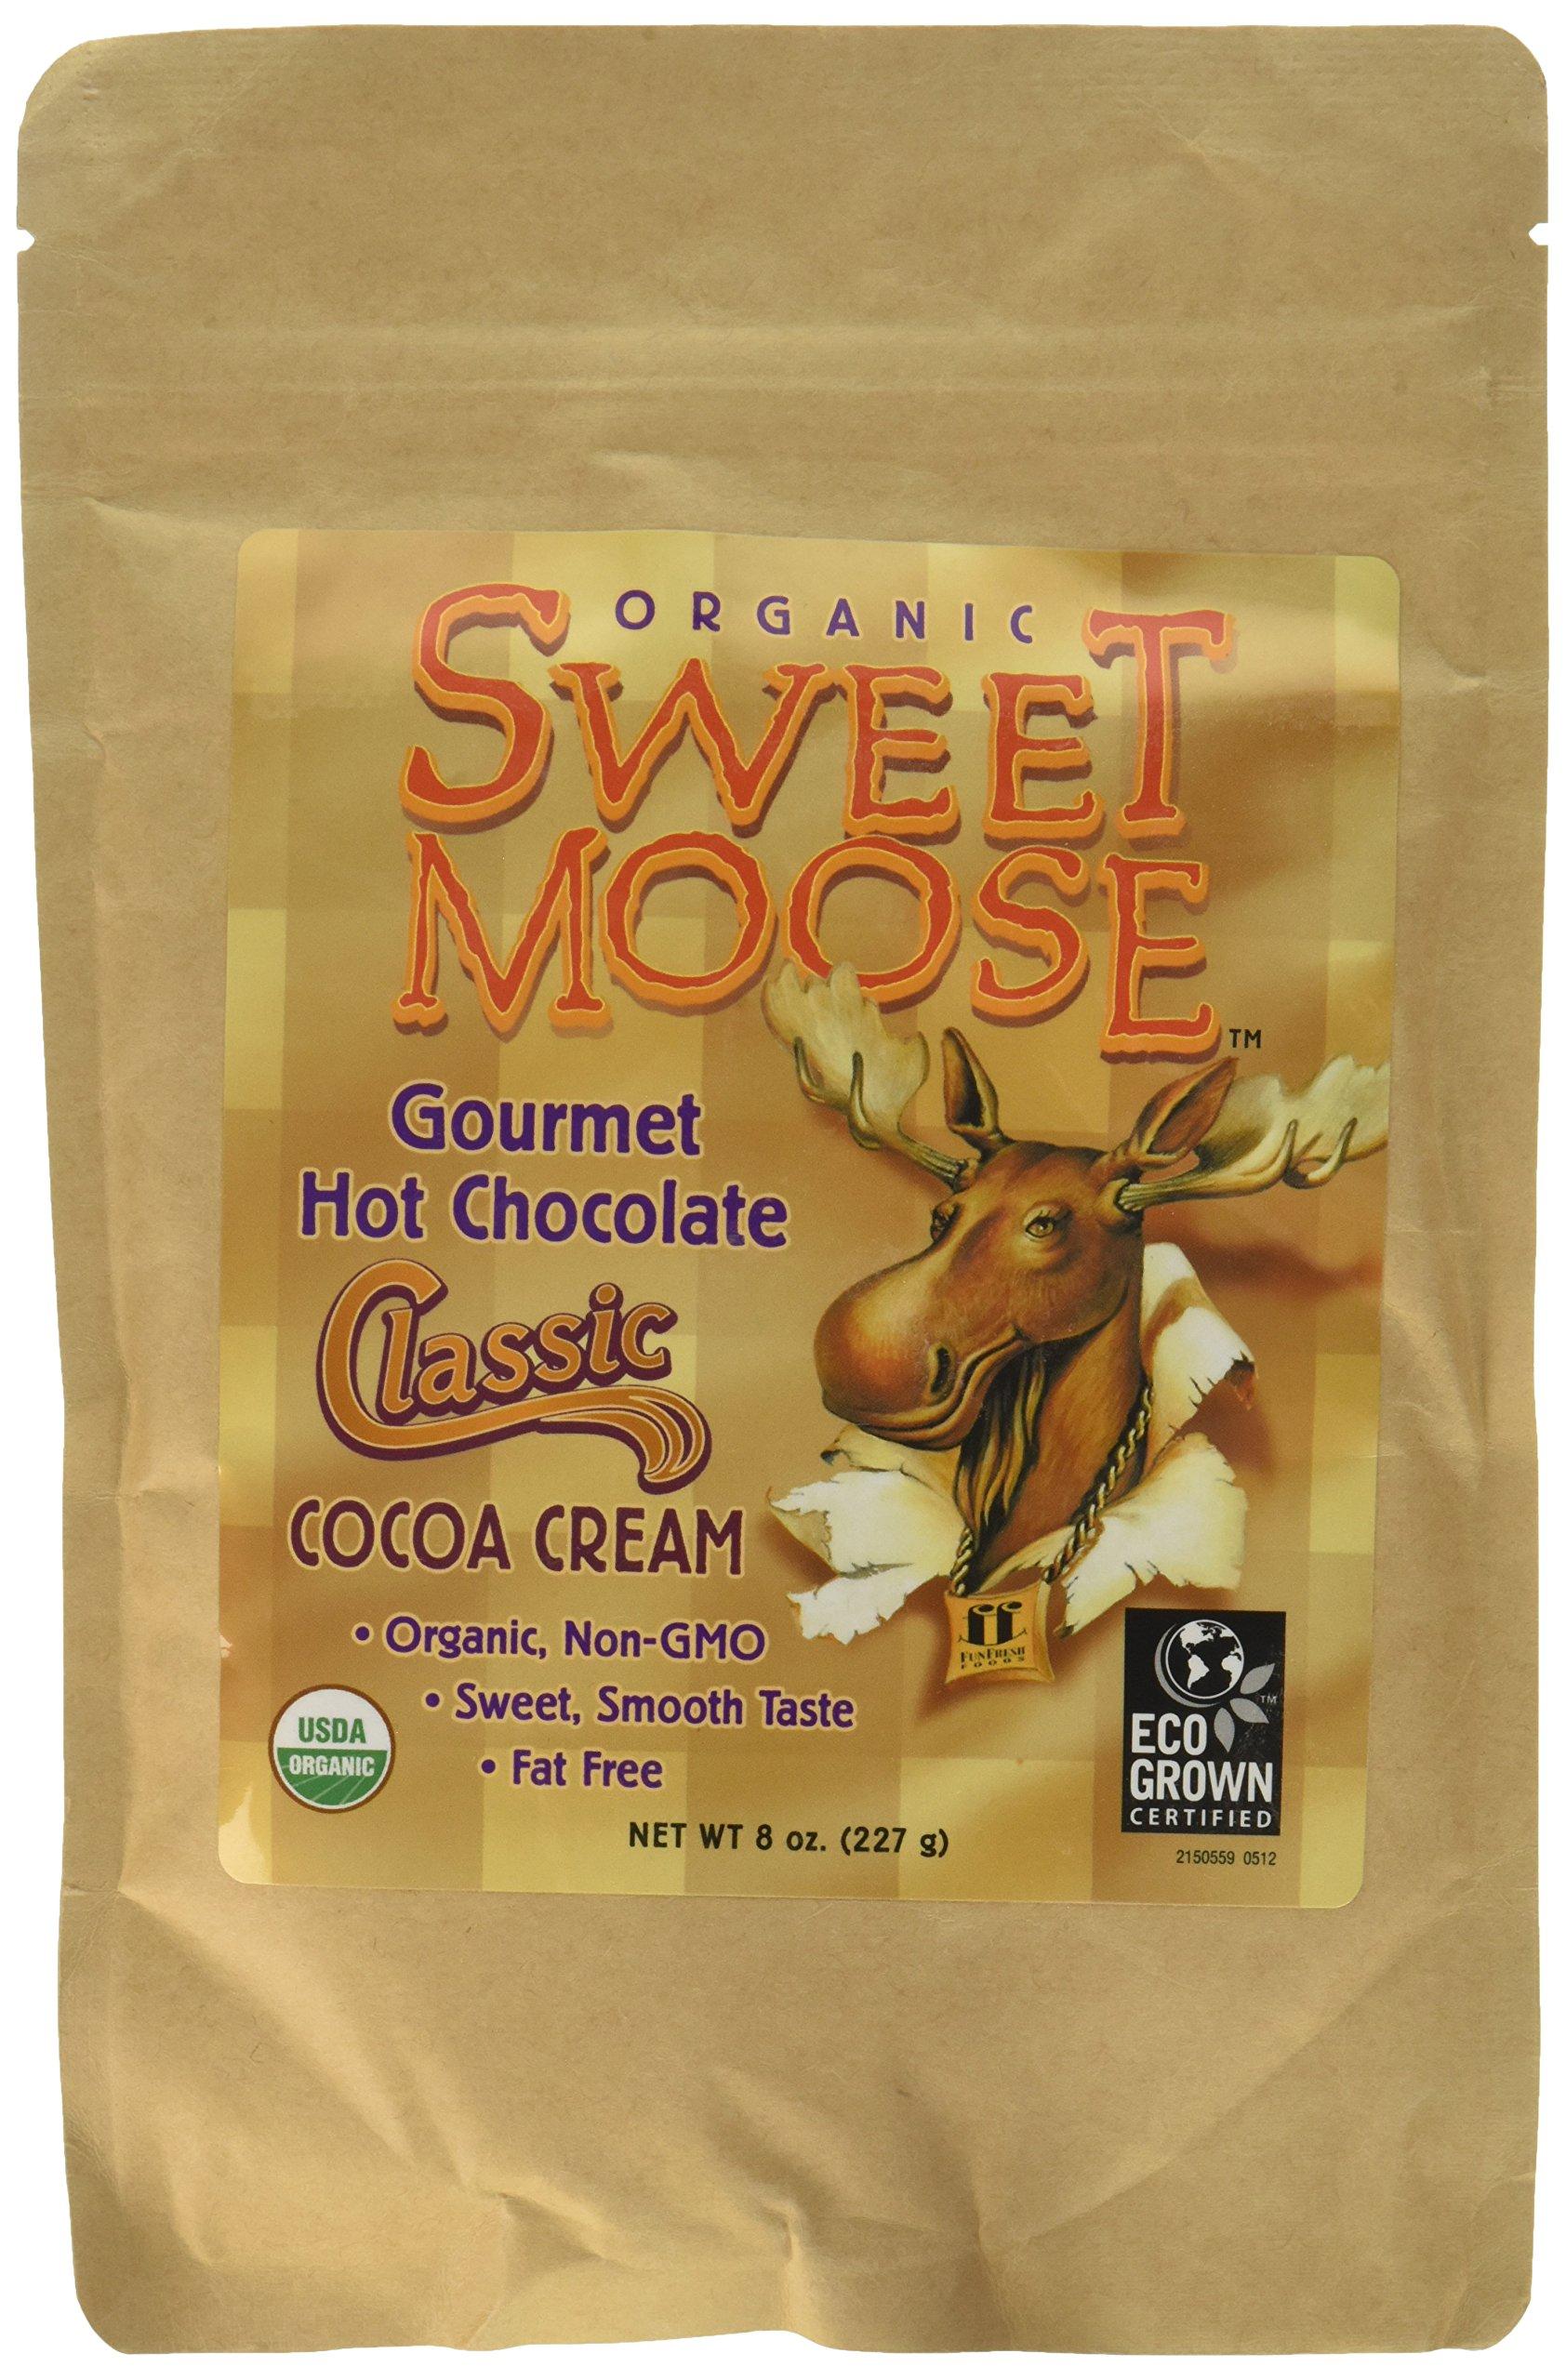 FunFresh Foods Sweet Moose Organic Gourmet Hot Chocolate/Classic Cocoa Cream Energy Strip, 2 Count